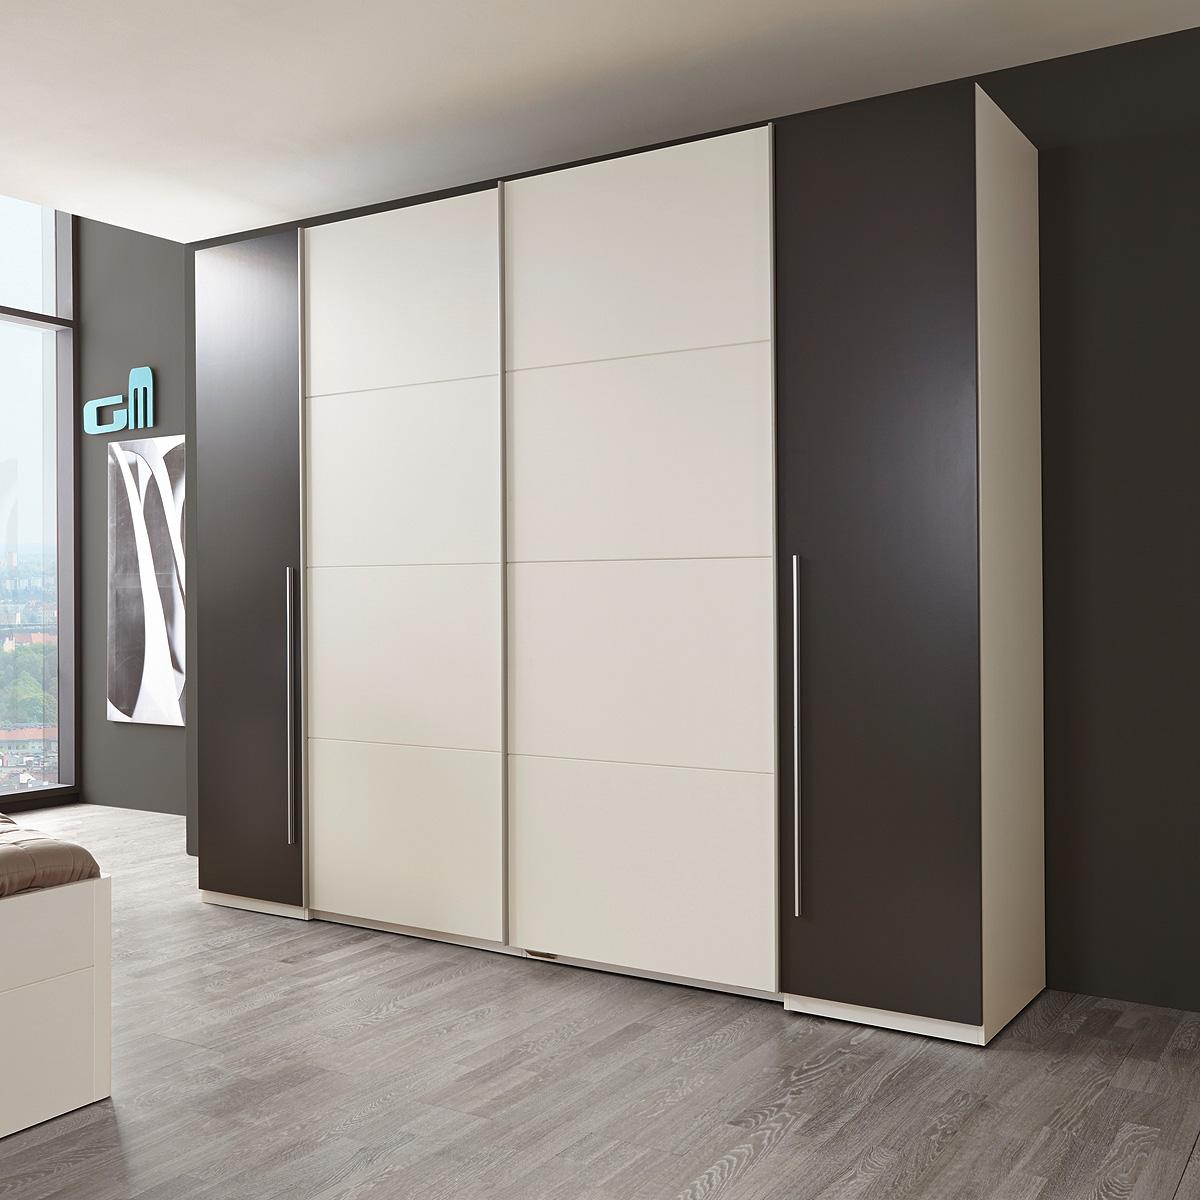 mondo kleiderschrank preis interessante. Black Bedroom Furniture Sets. Home Design Ideas